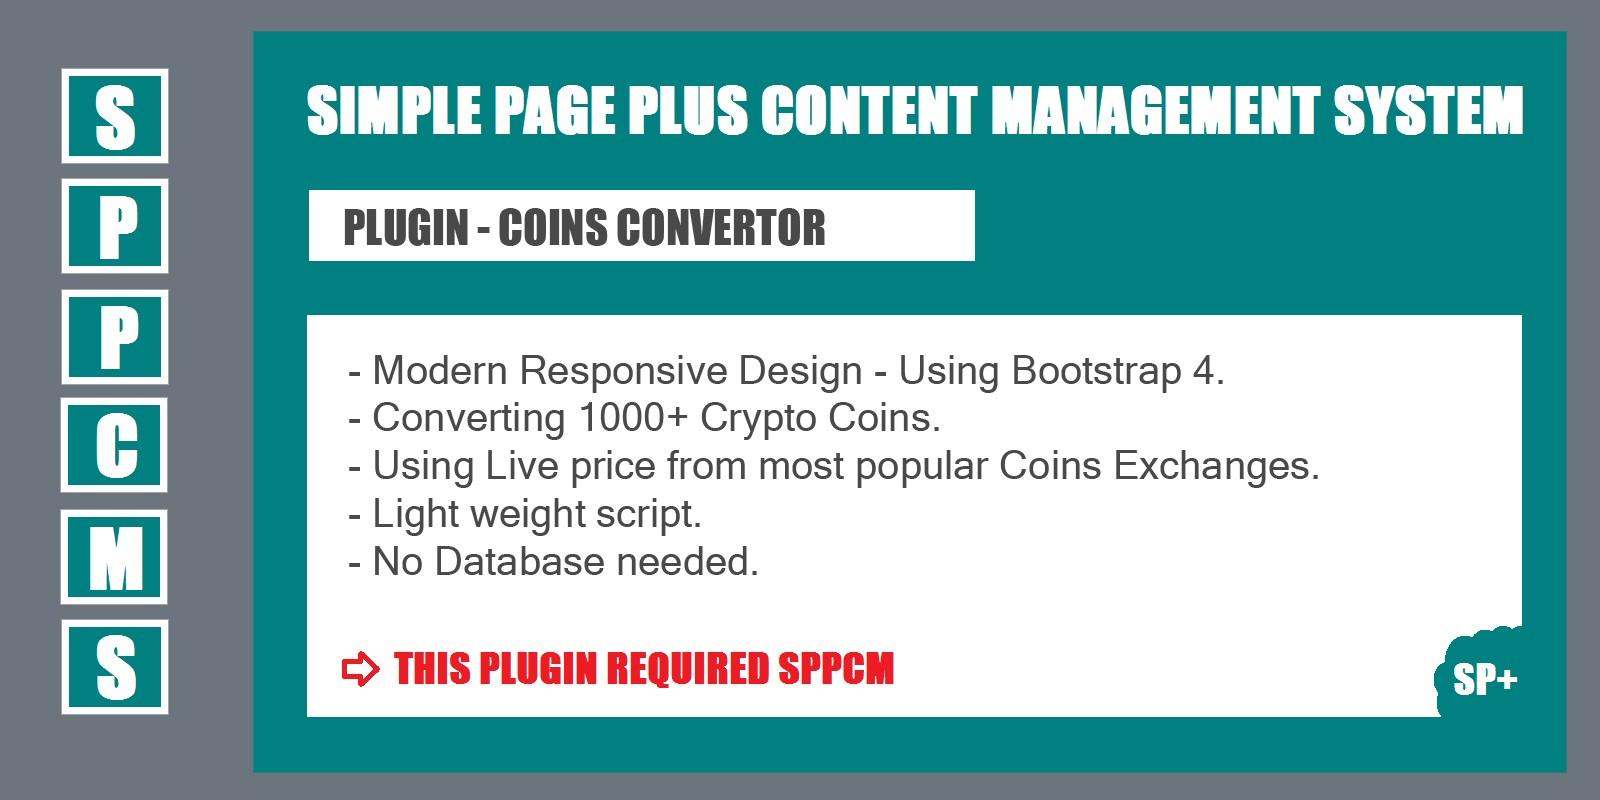 Coins Convertor - SPPCMS Plugin